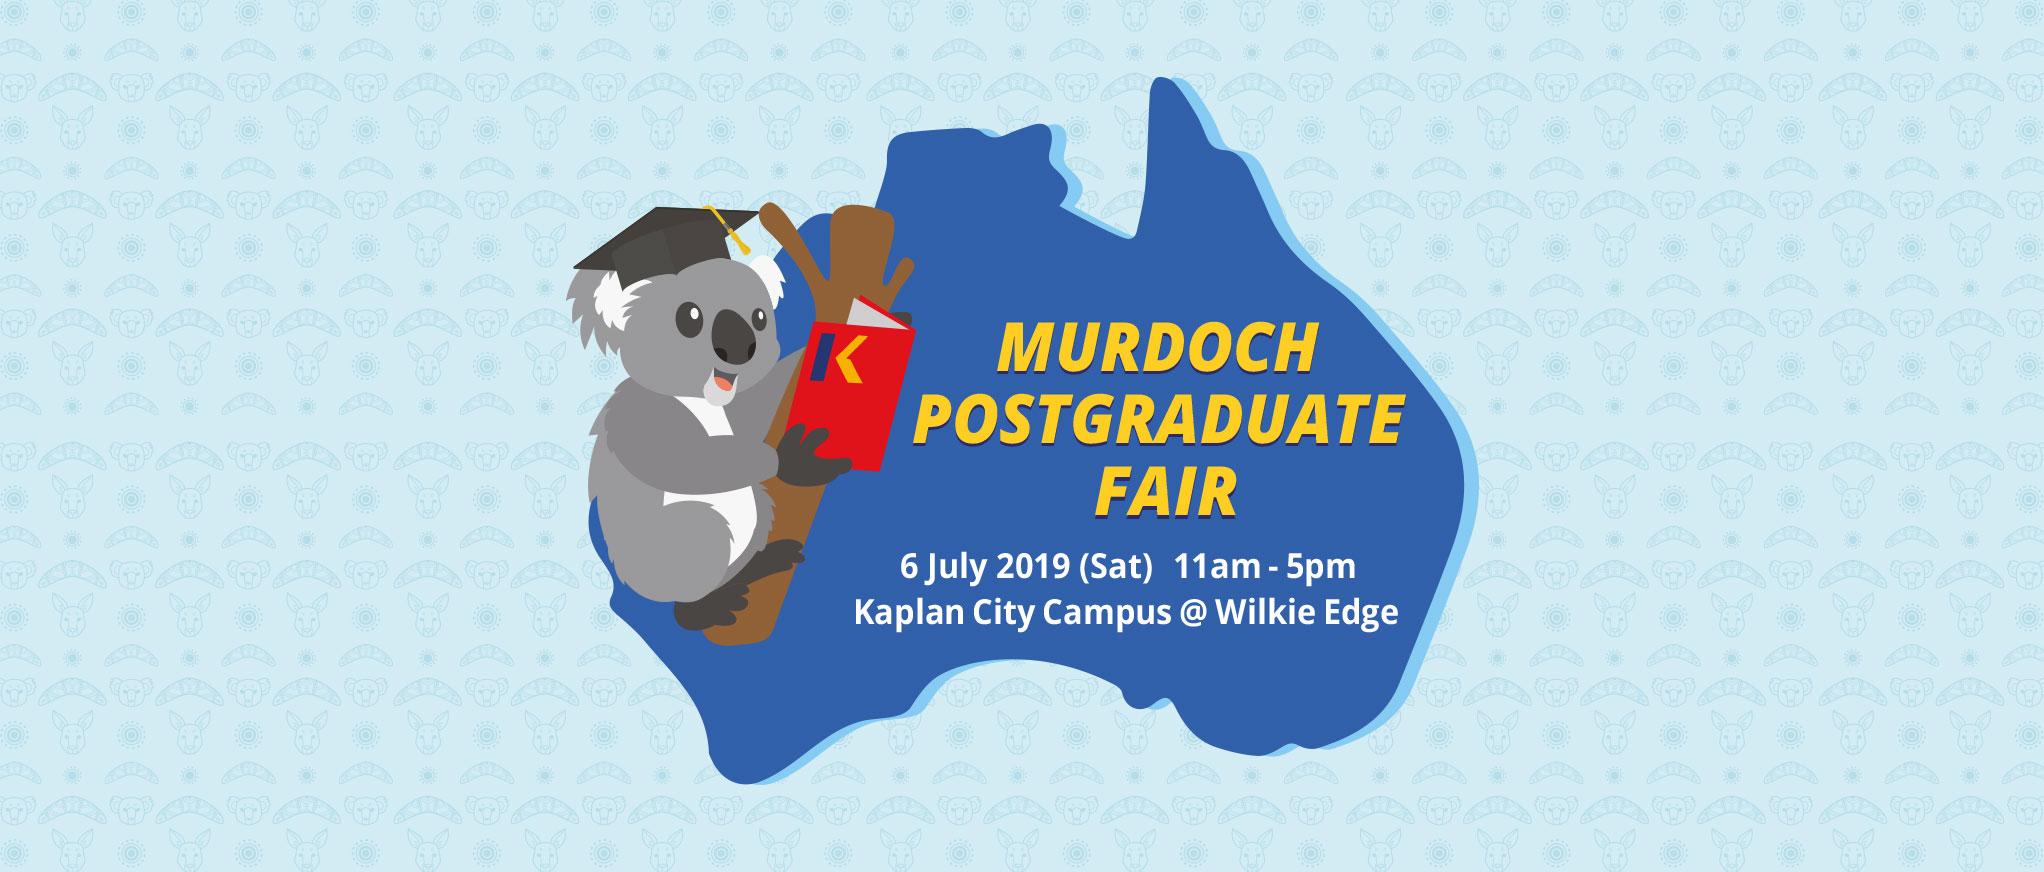 murdoch-university-postgraduate-fair-slide-generic-1